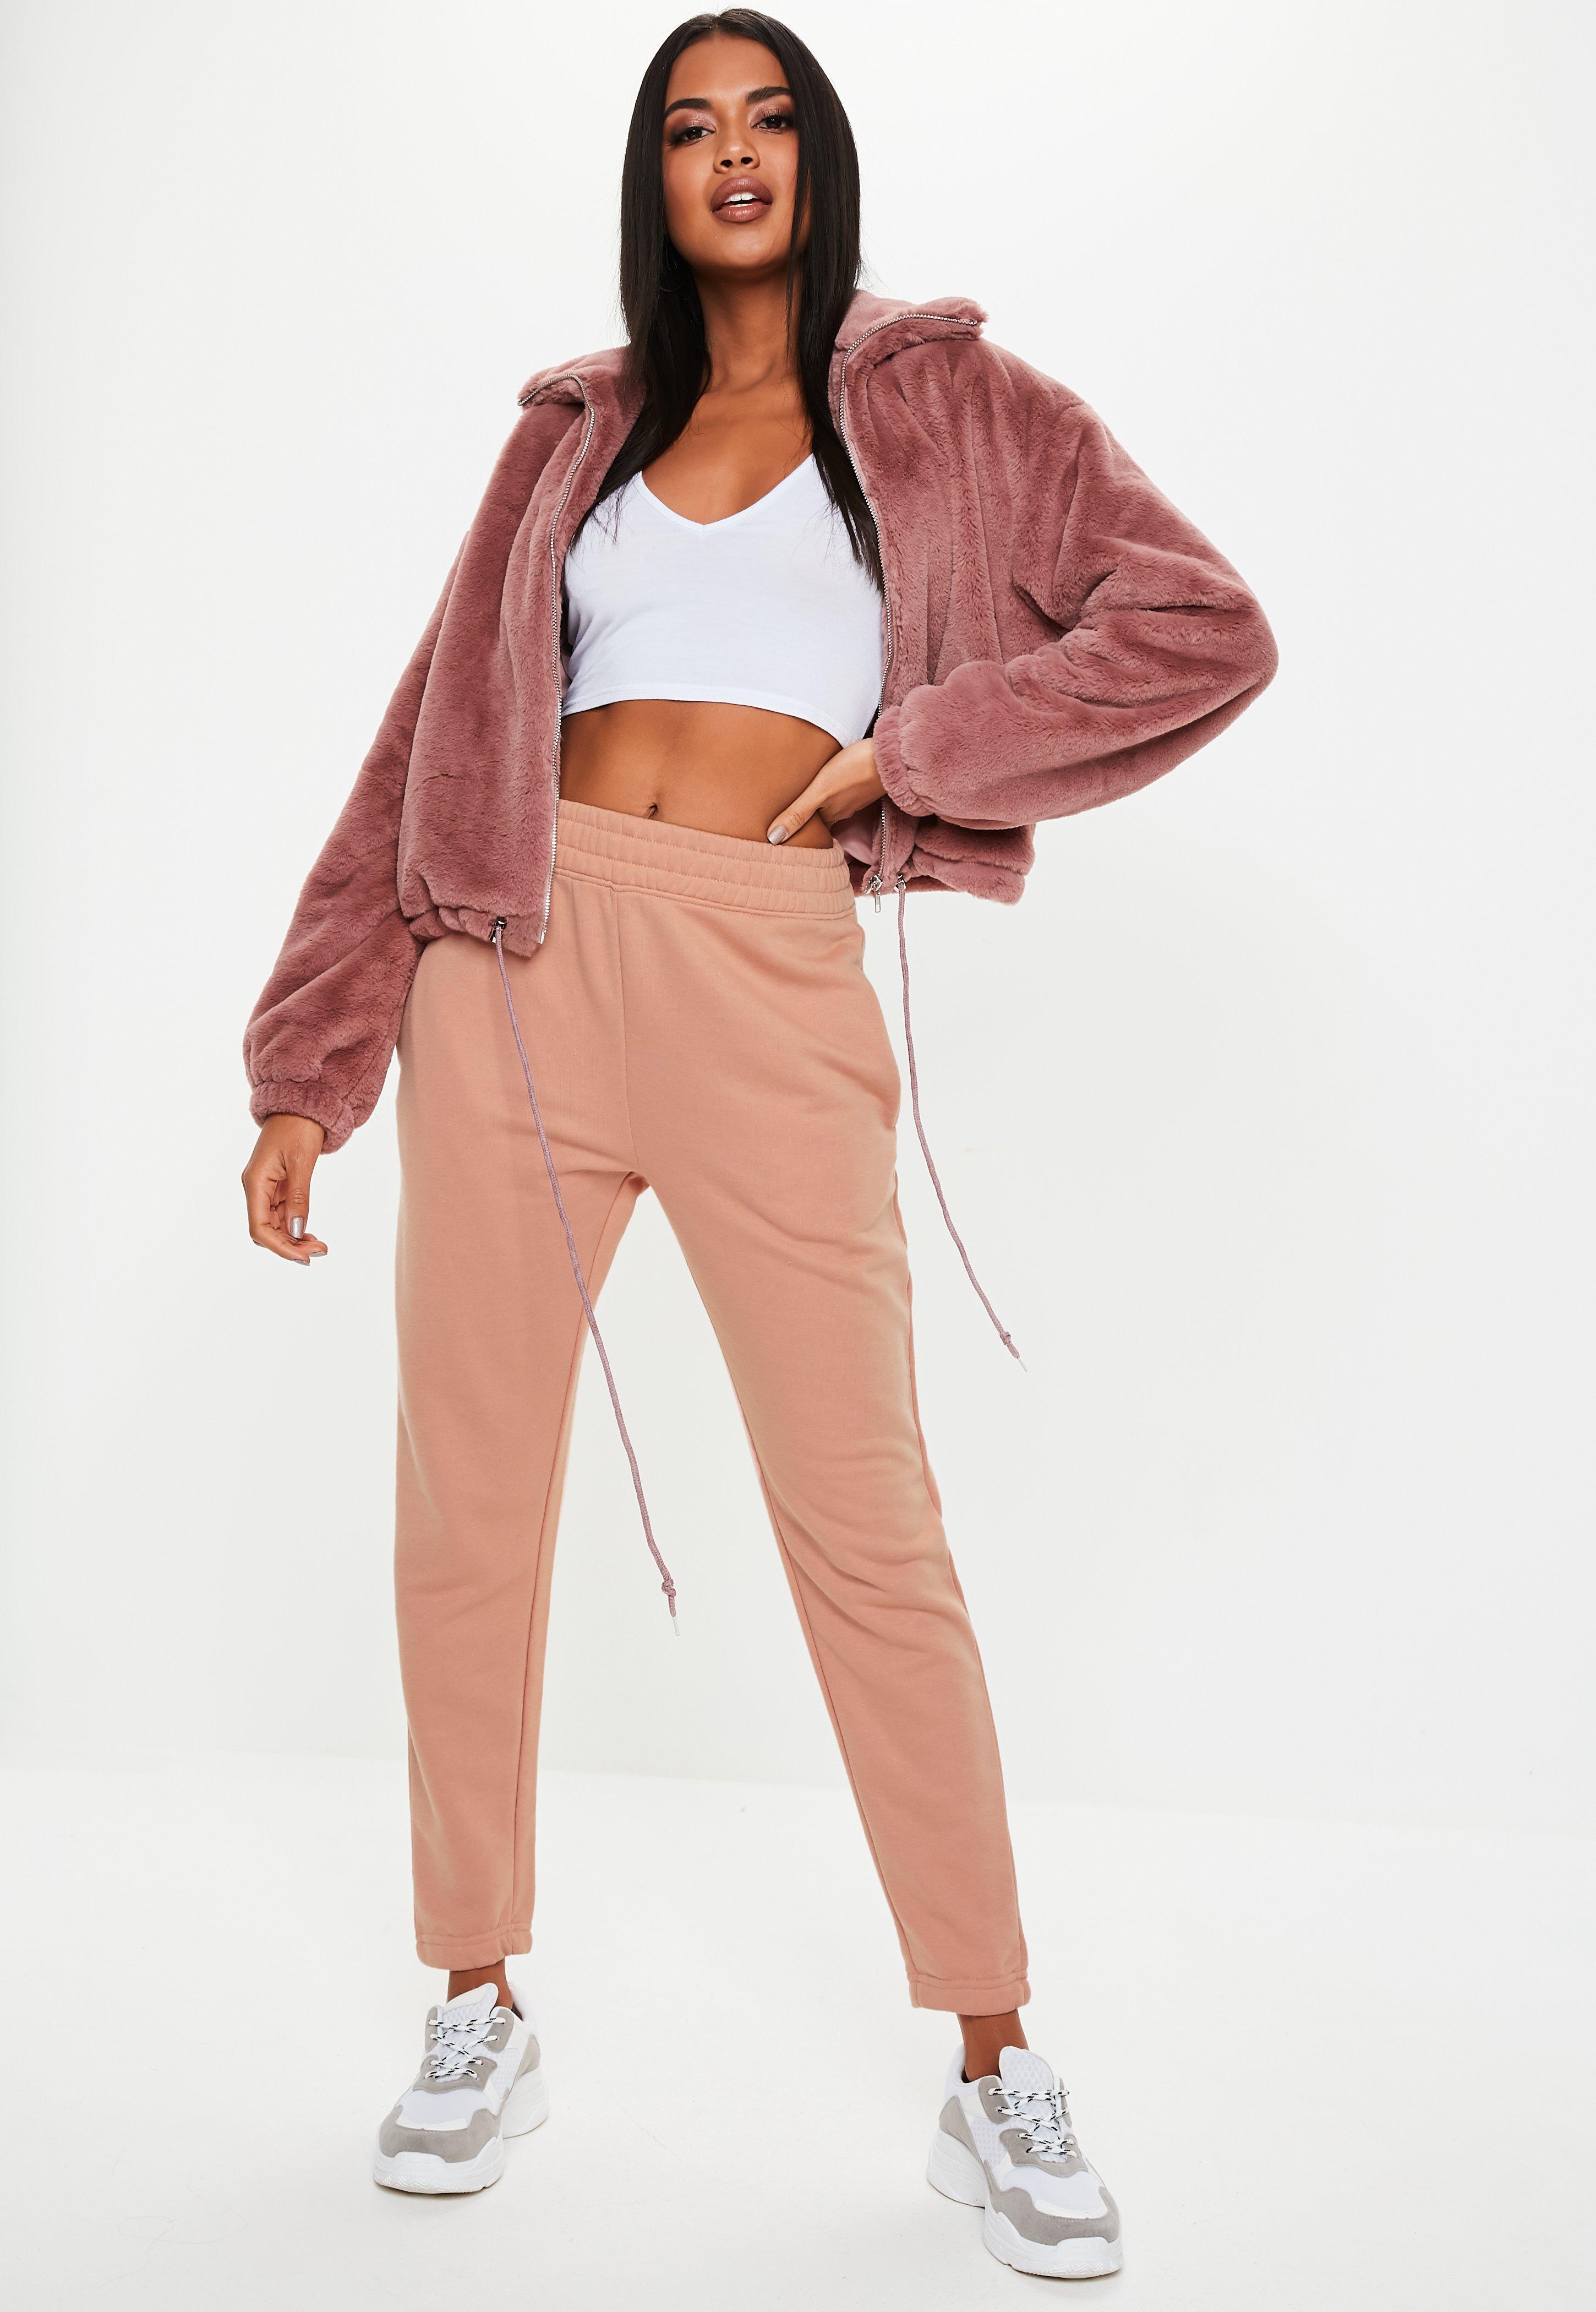 Pantalons Petite Vêtements Vêtements Pantalons Pantalons Petite Vêtements Petite wqIO65Hwx